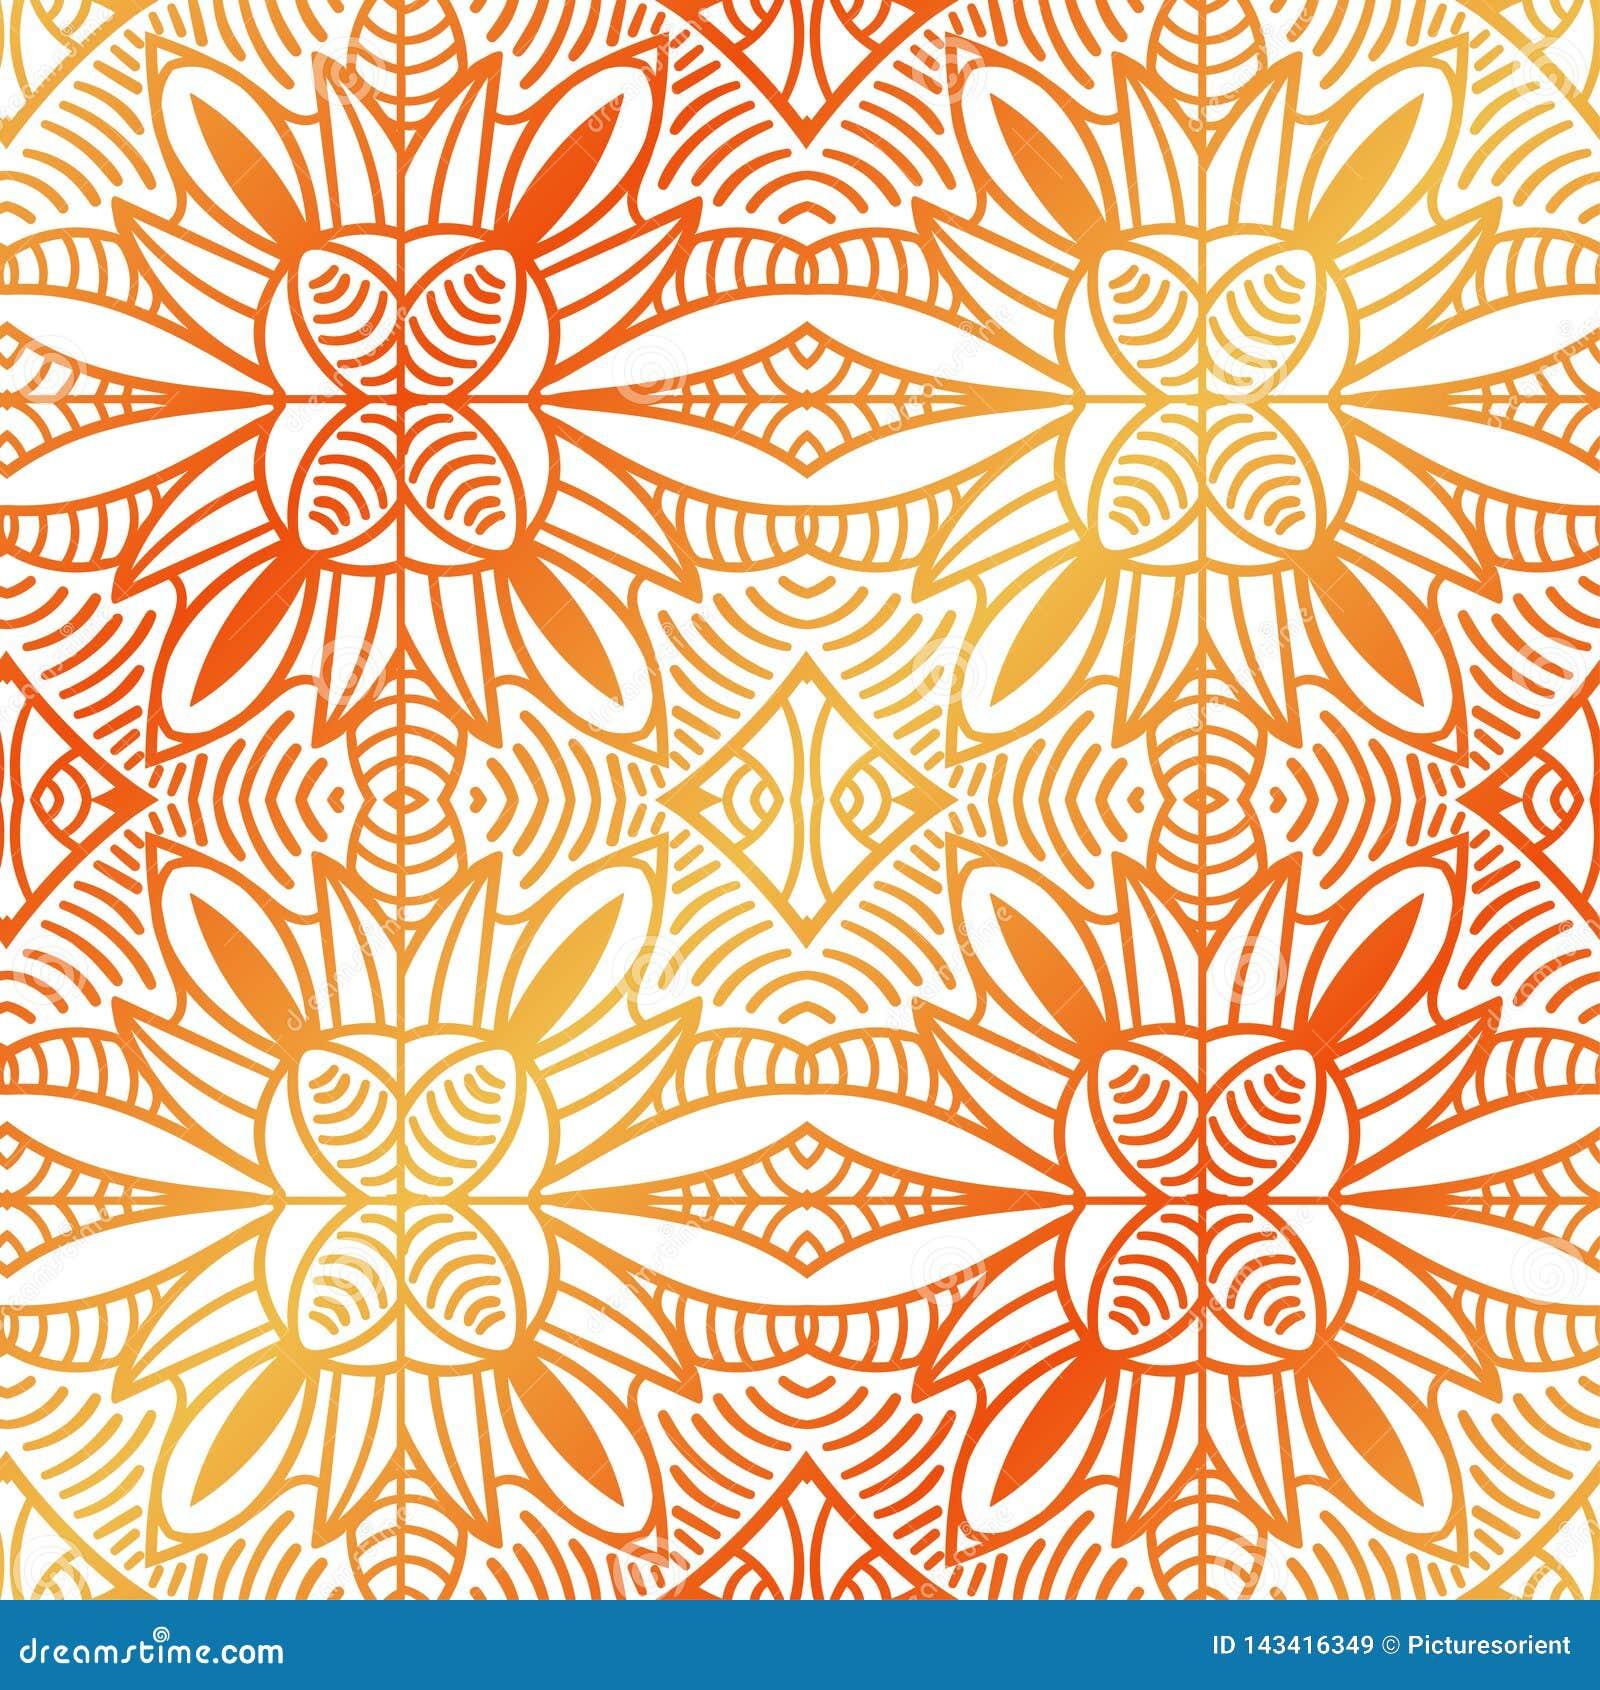 Origen étnico ornamental decorativo tribal del extracto